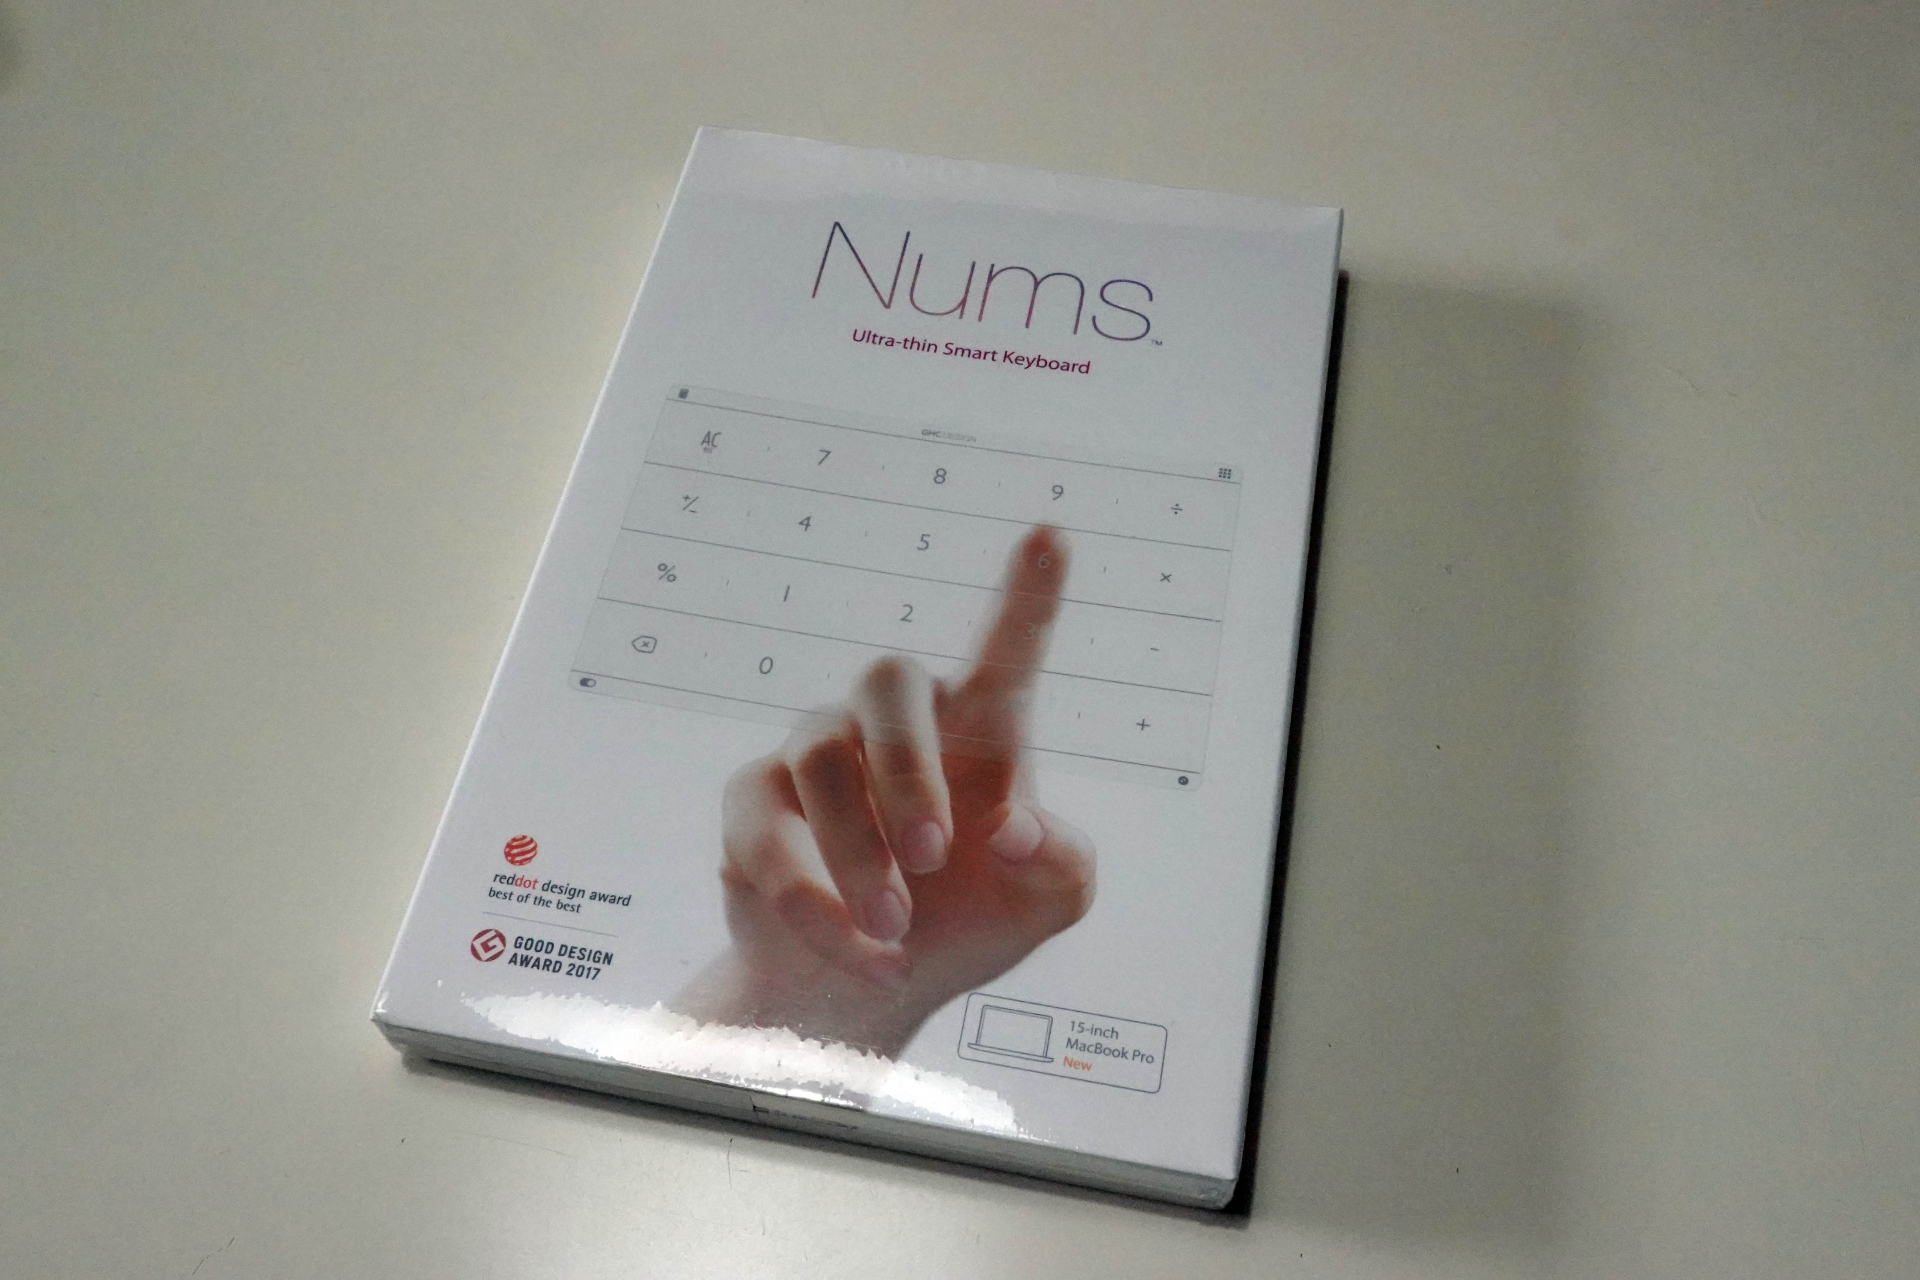 Numsパッケージ